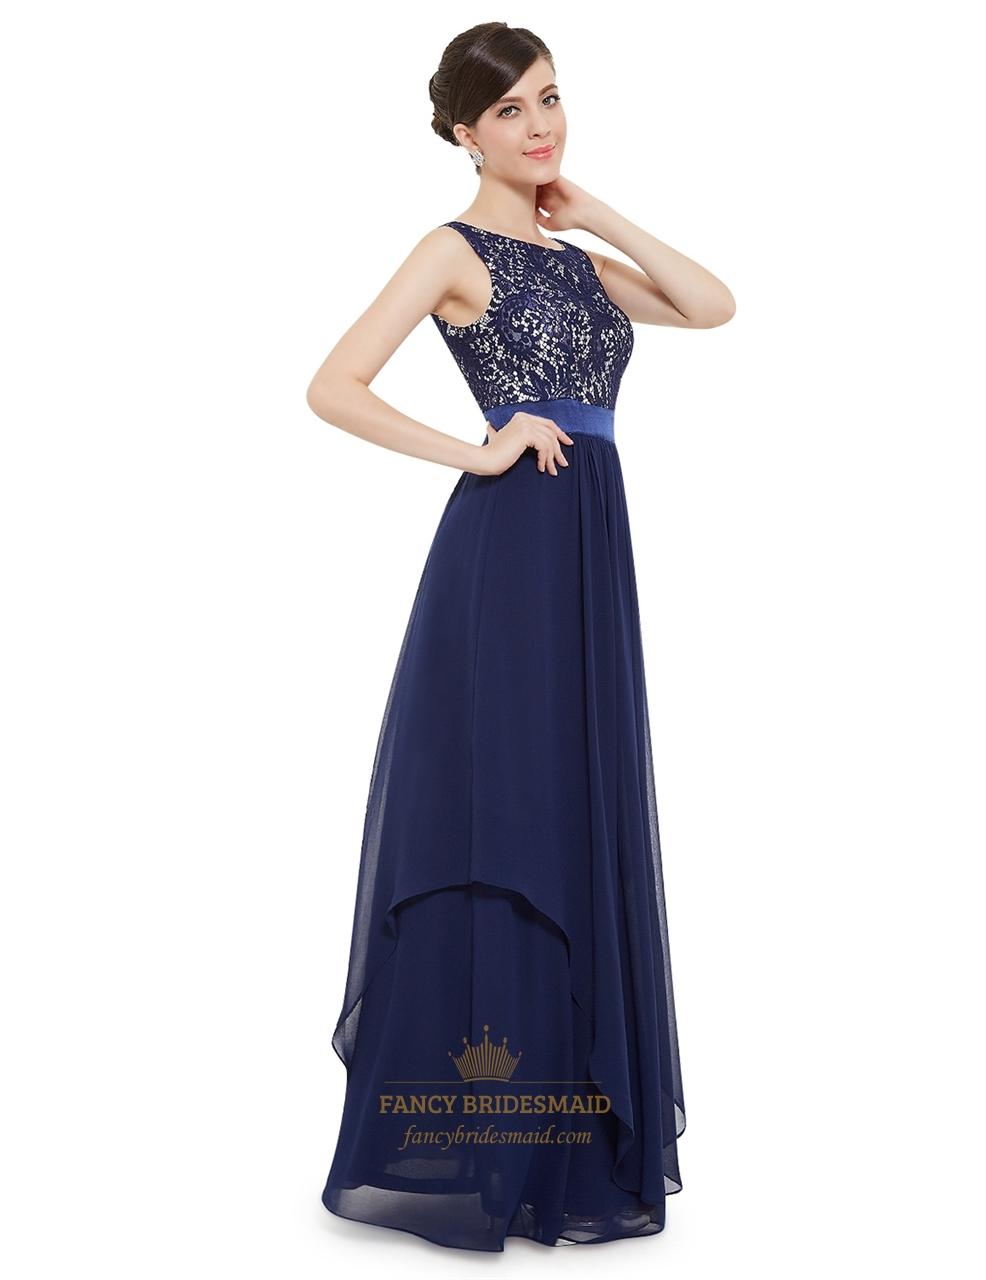 926ba979c4f Elegant Navy Blue Chiffon Long Bridesmaid Dresses With Lace Bodice ...